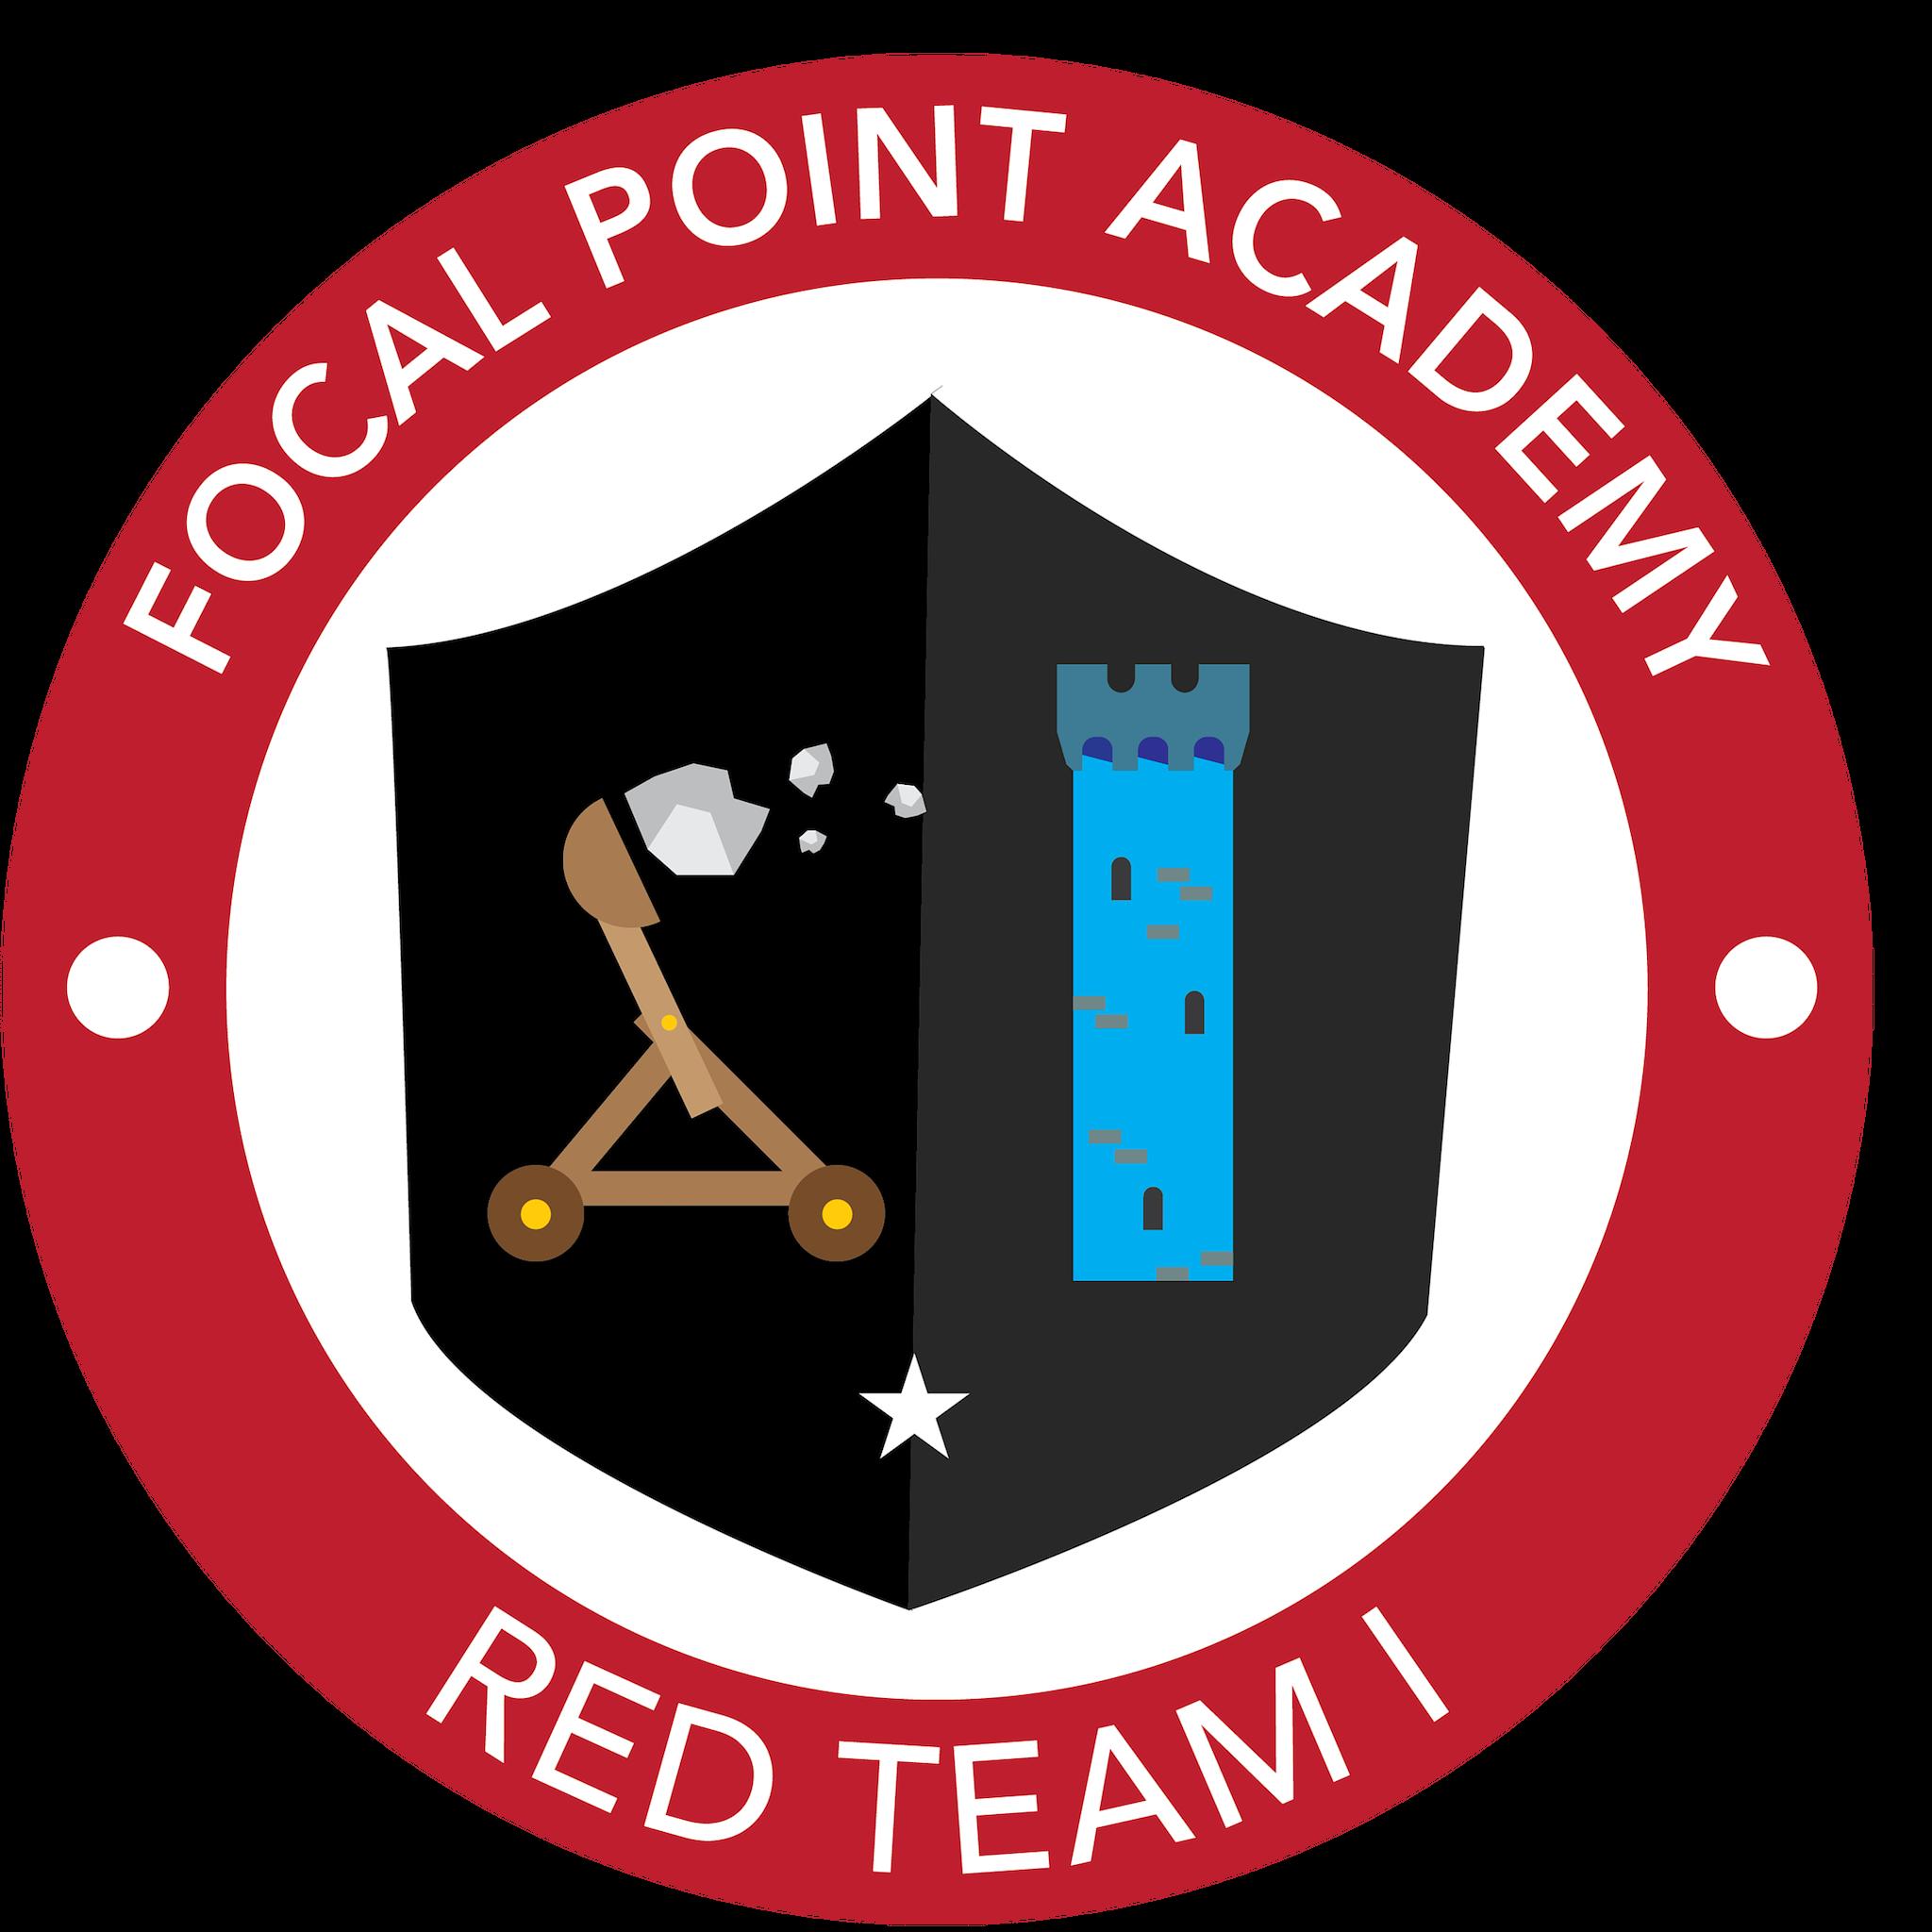 Red Team - Level 1